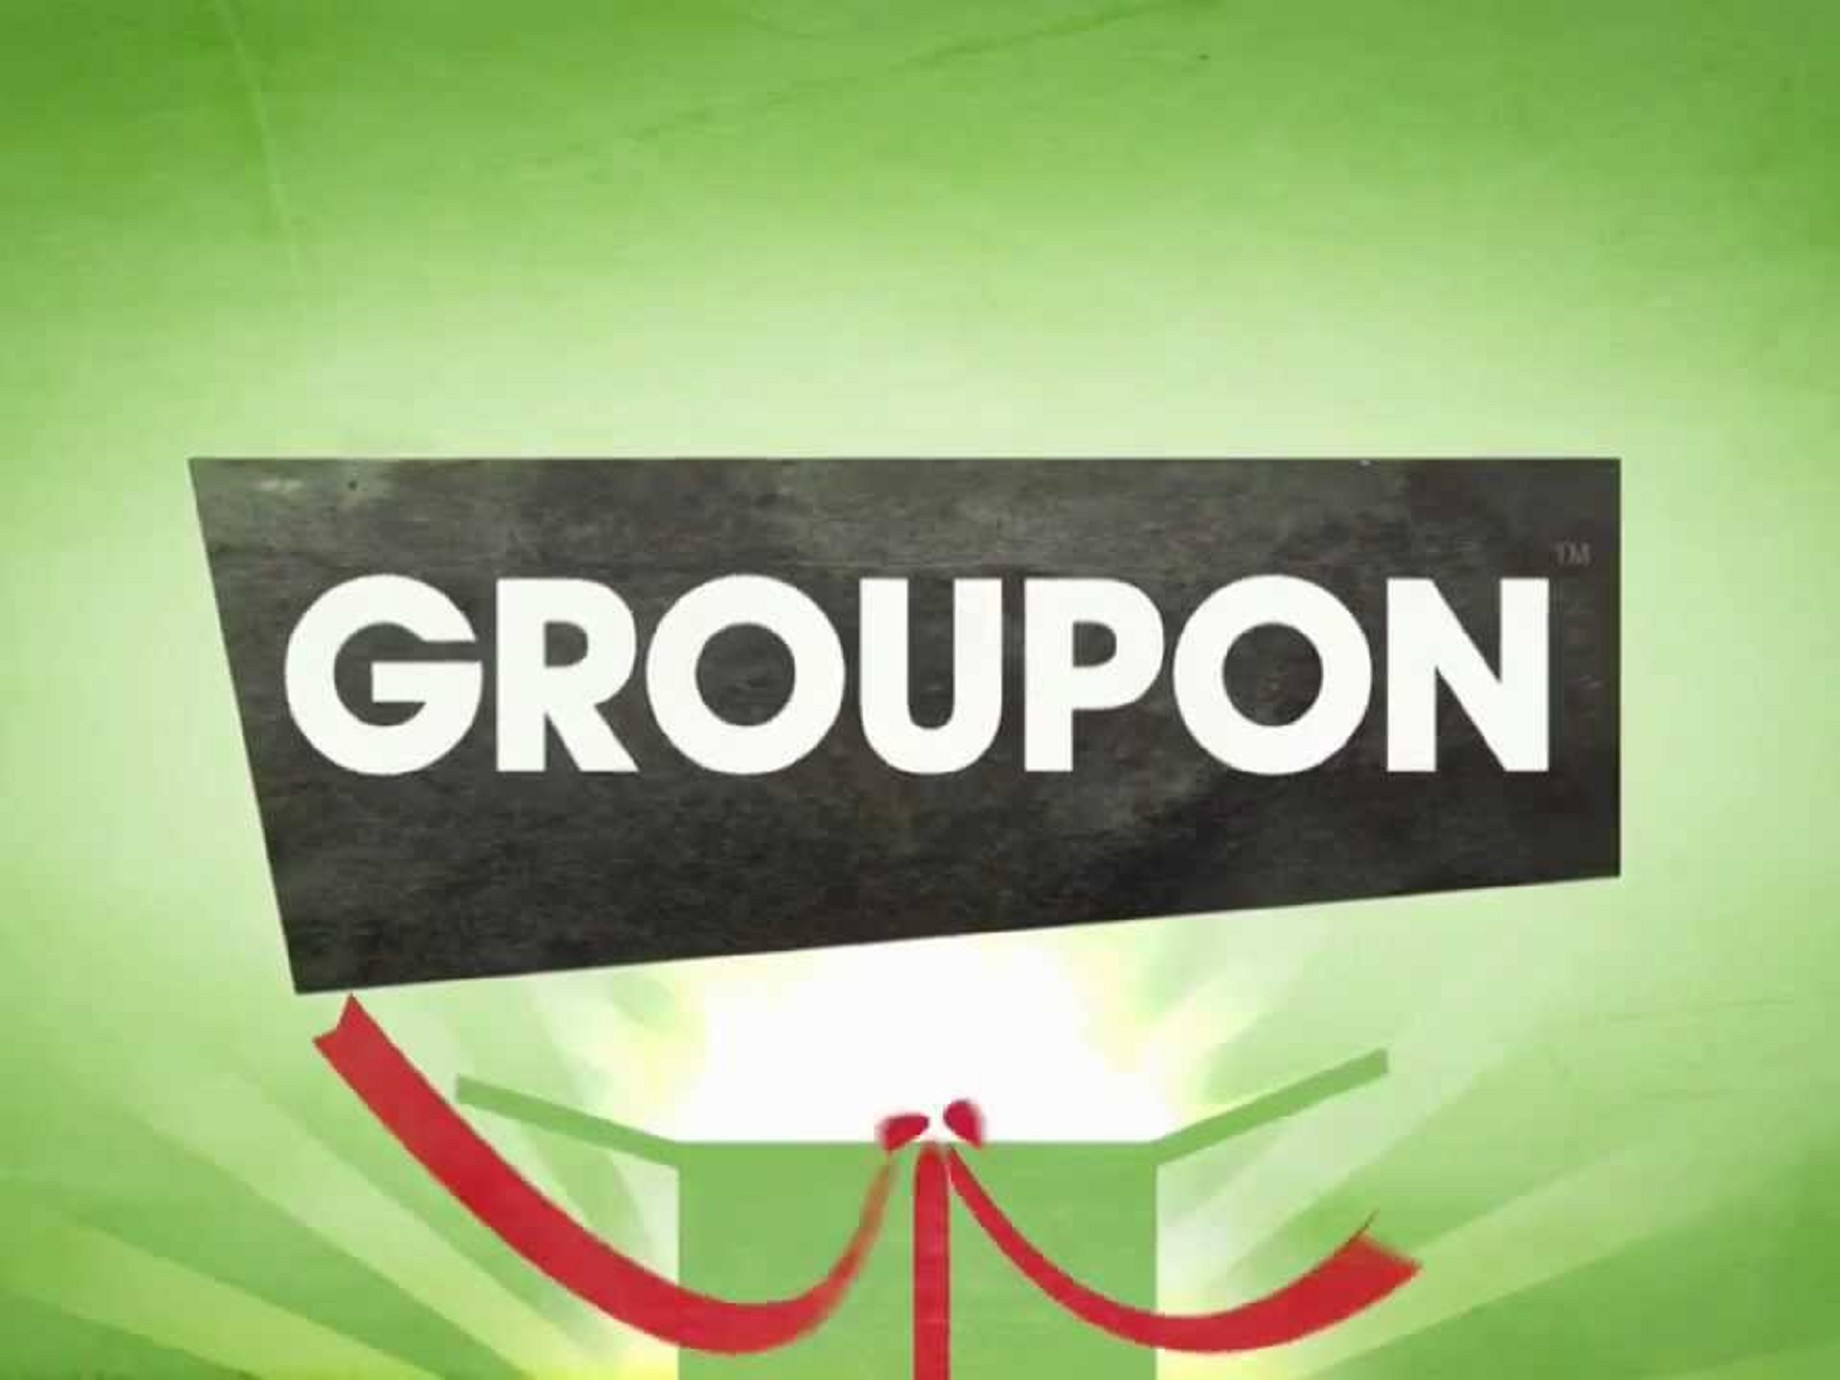 【Groupon Taiwan倒下,解密台灣團購網專題】2015年台灣團購網站競爭力分析